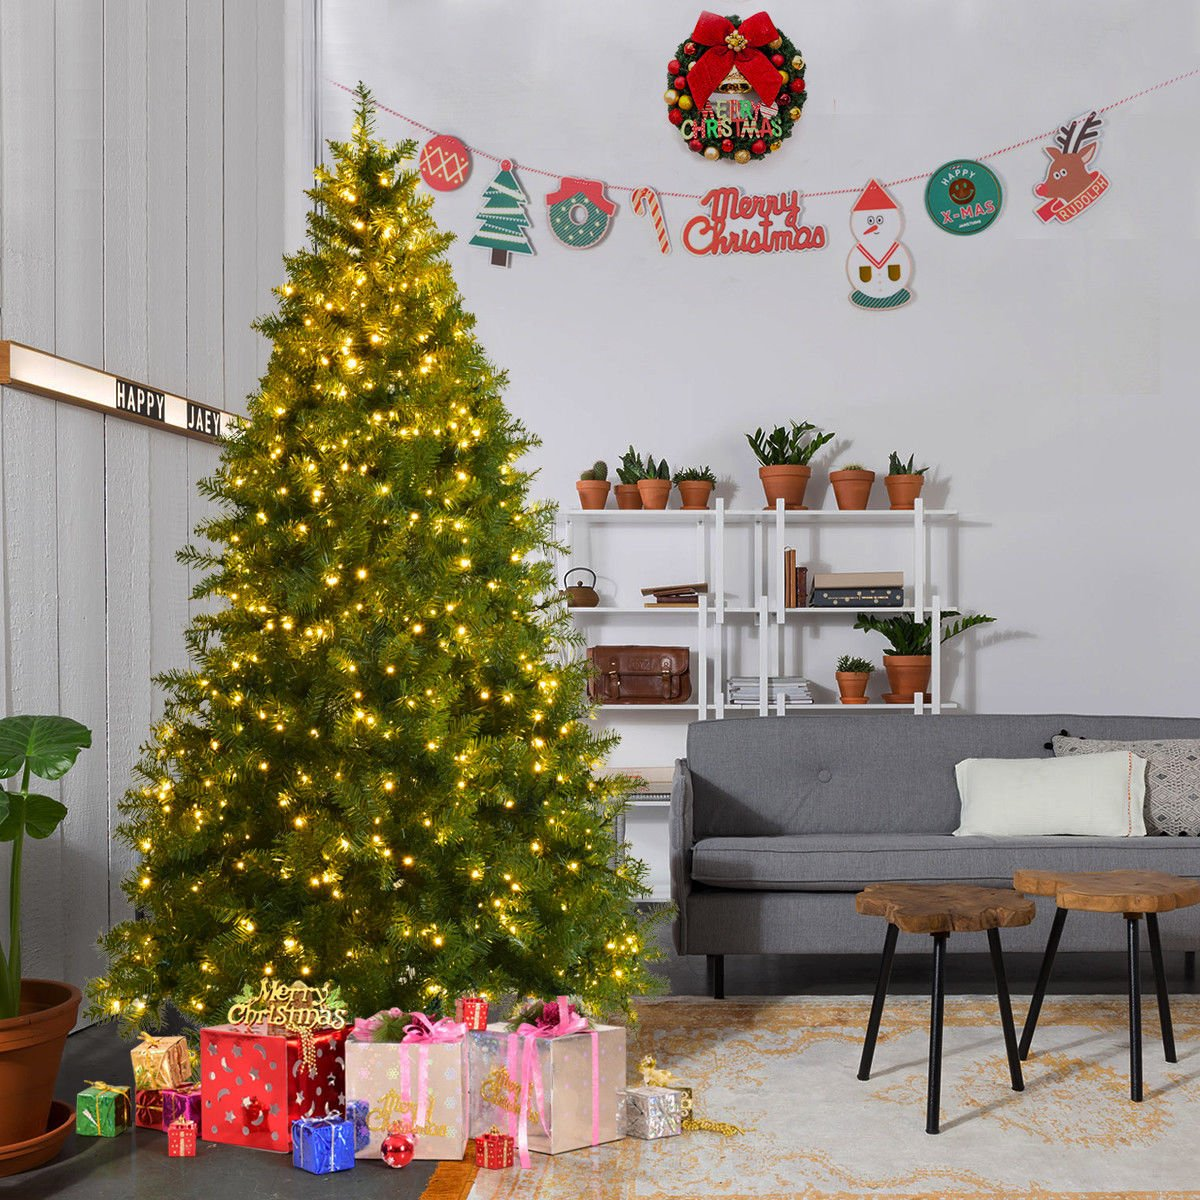 Goplus Pre-Lit Christmas Tree Artificial PVC Spruce Hinged w/ 700 LED Lights & Solid Metal Legs (7 Ft)